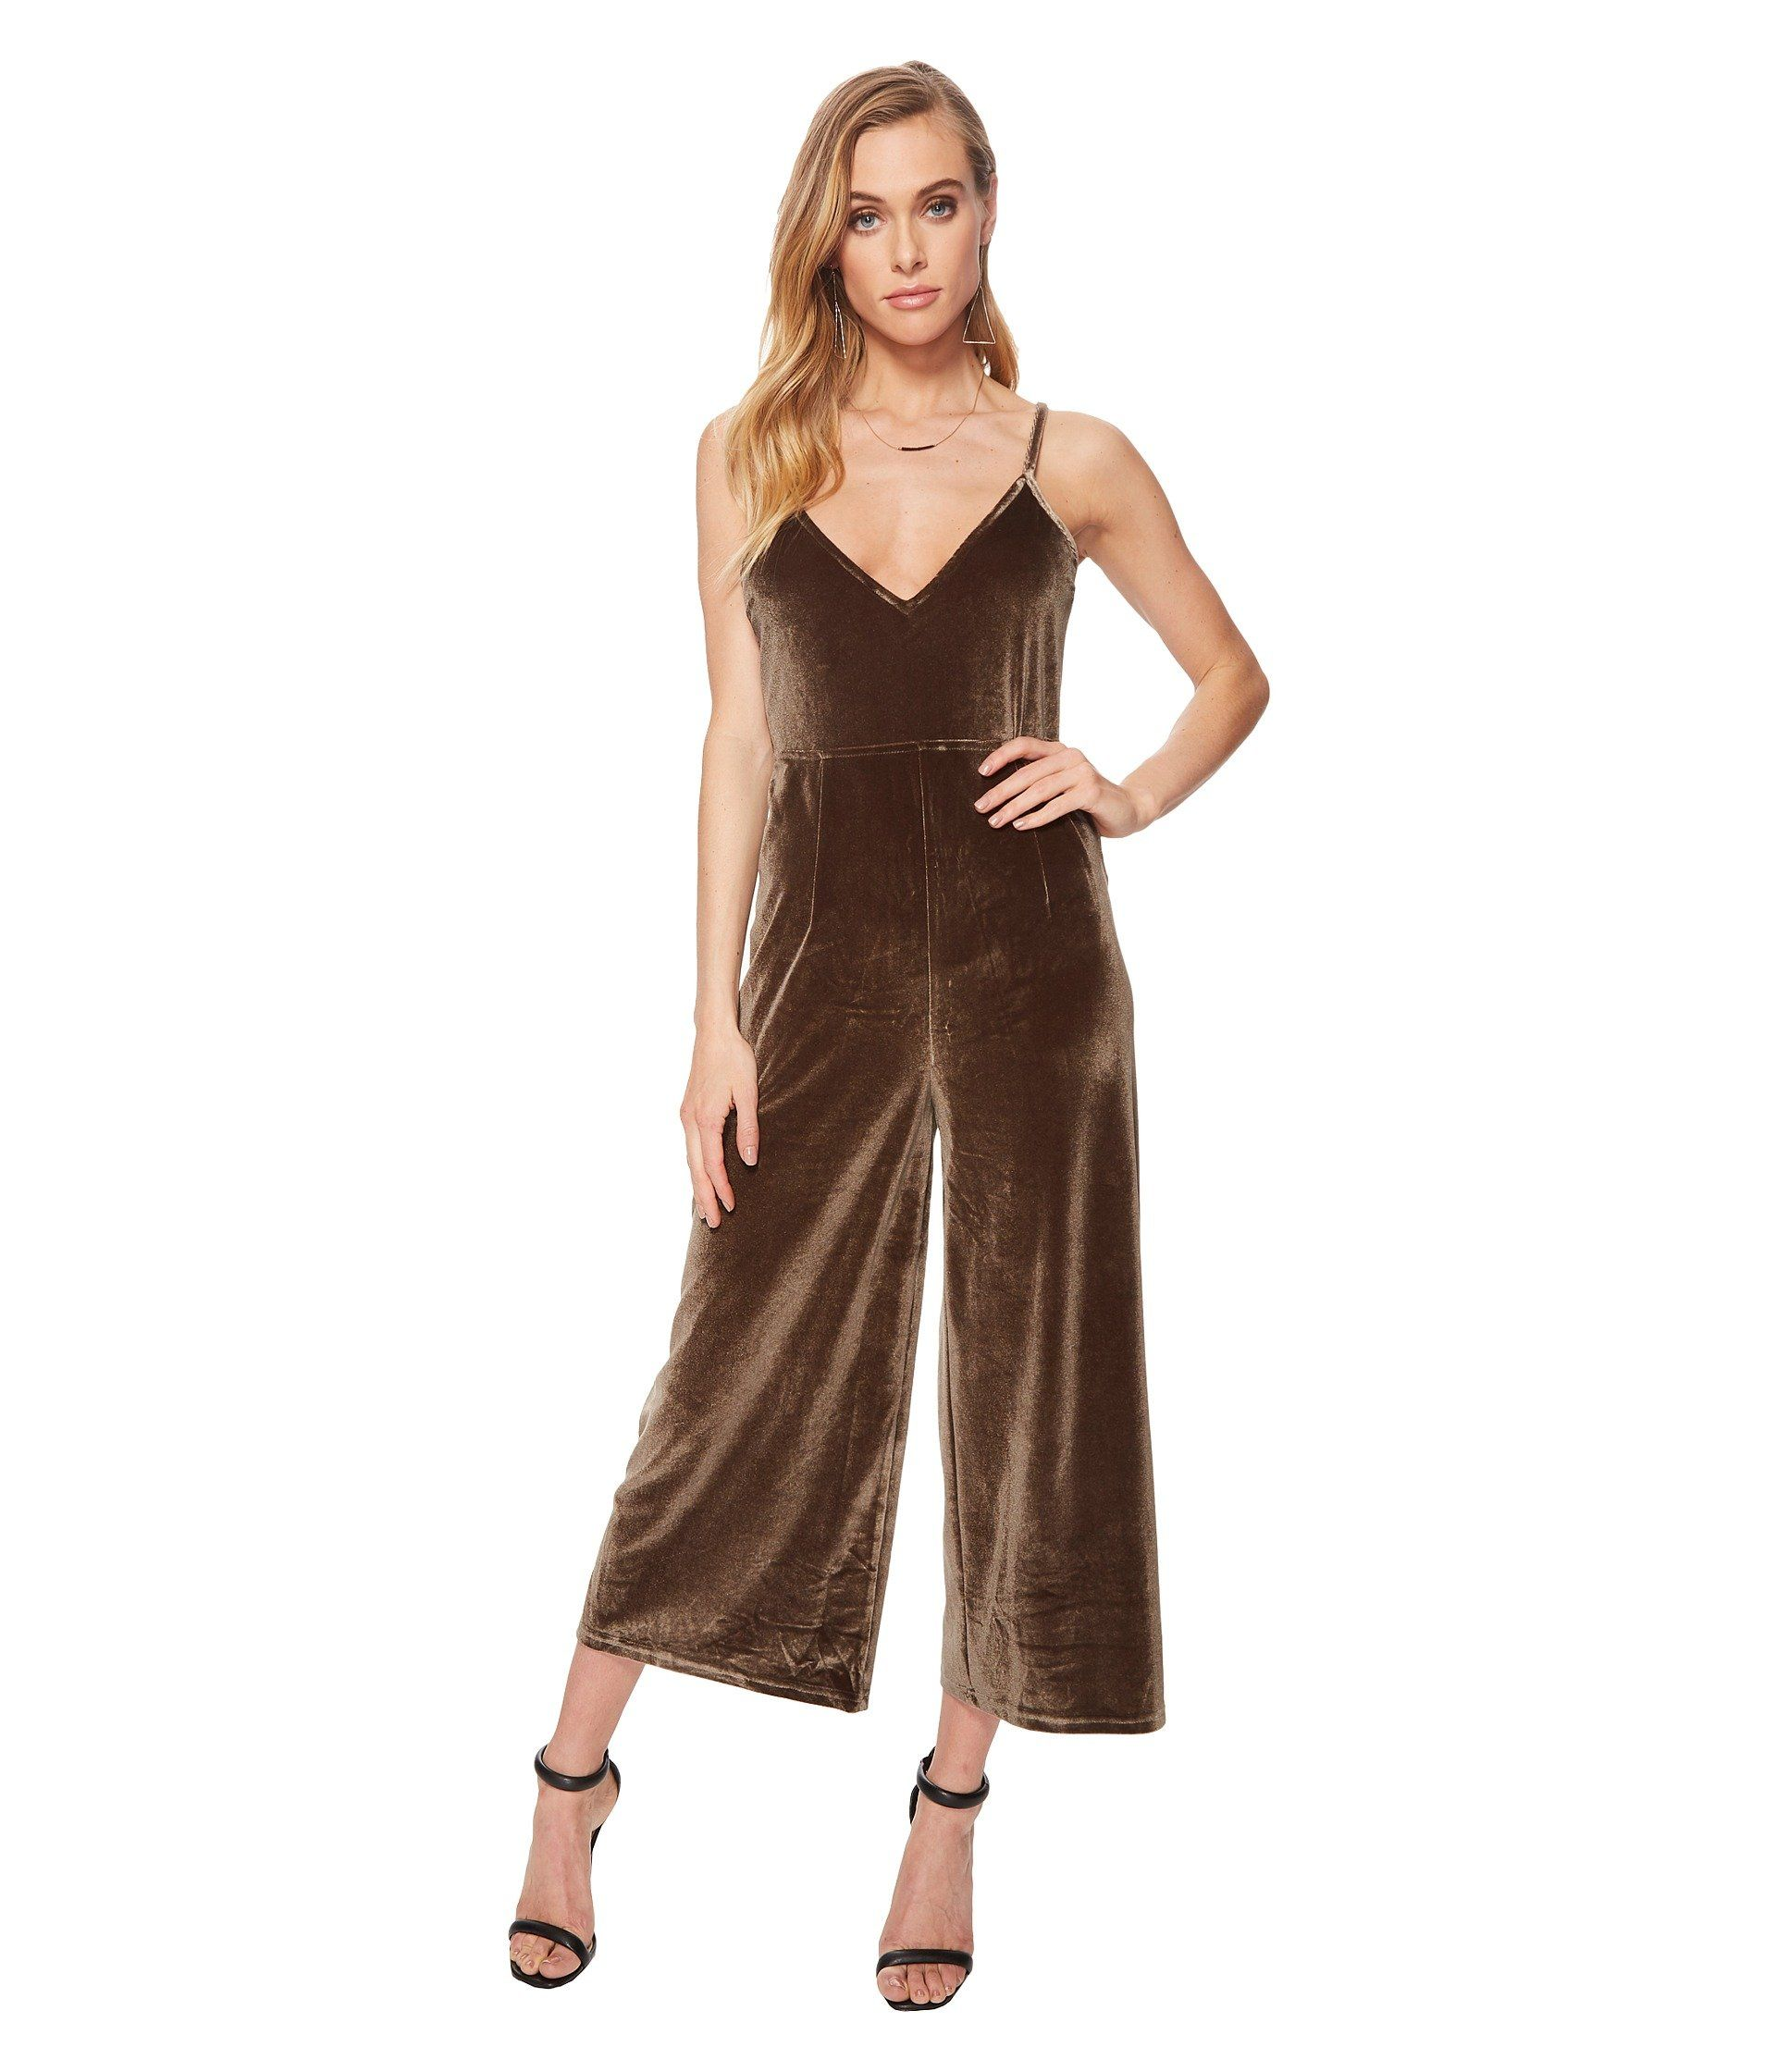 ba0e3c8d69 MINKPINK Velvet Jumpsuit.  minkpink  cloth